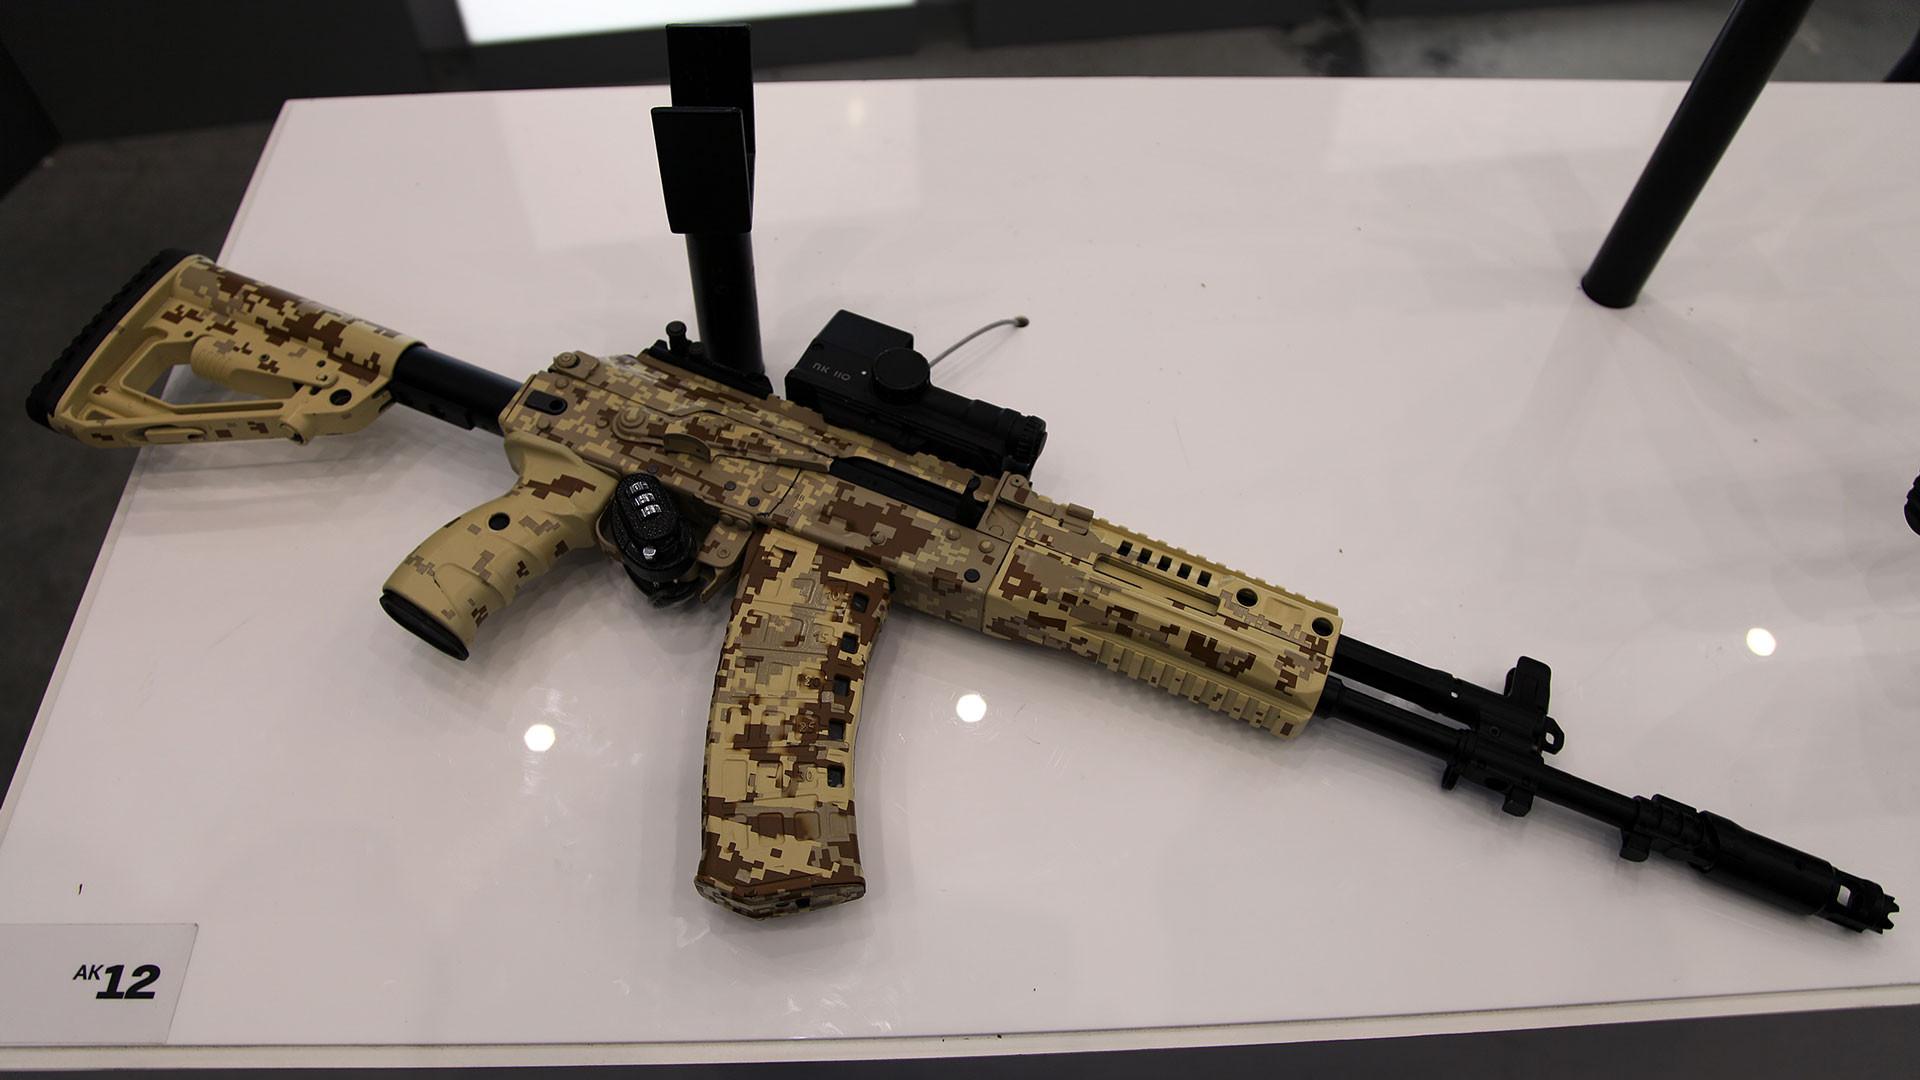 "<p><span>Фото: &copy; <a href=""https://en.wikipedia.org/wiki/AK-12#/media/File:5,45mm_AK-12_6P70_assault_rifle_at_Military-technical_forum_ARMY-2016_03.jpg"" target=""_blank"">wikipedia.org/Кузьмин Виталий Владимирович&nbsp;</a></span></p>"